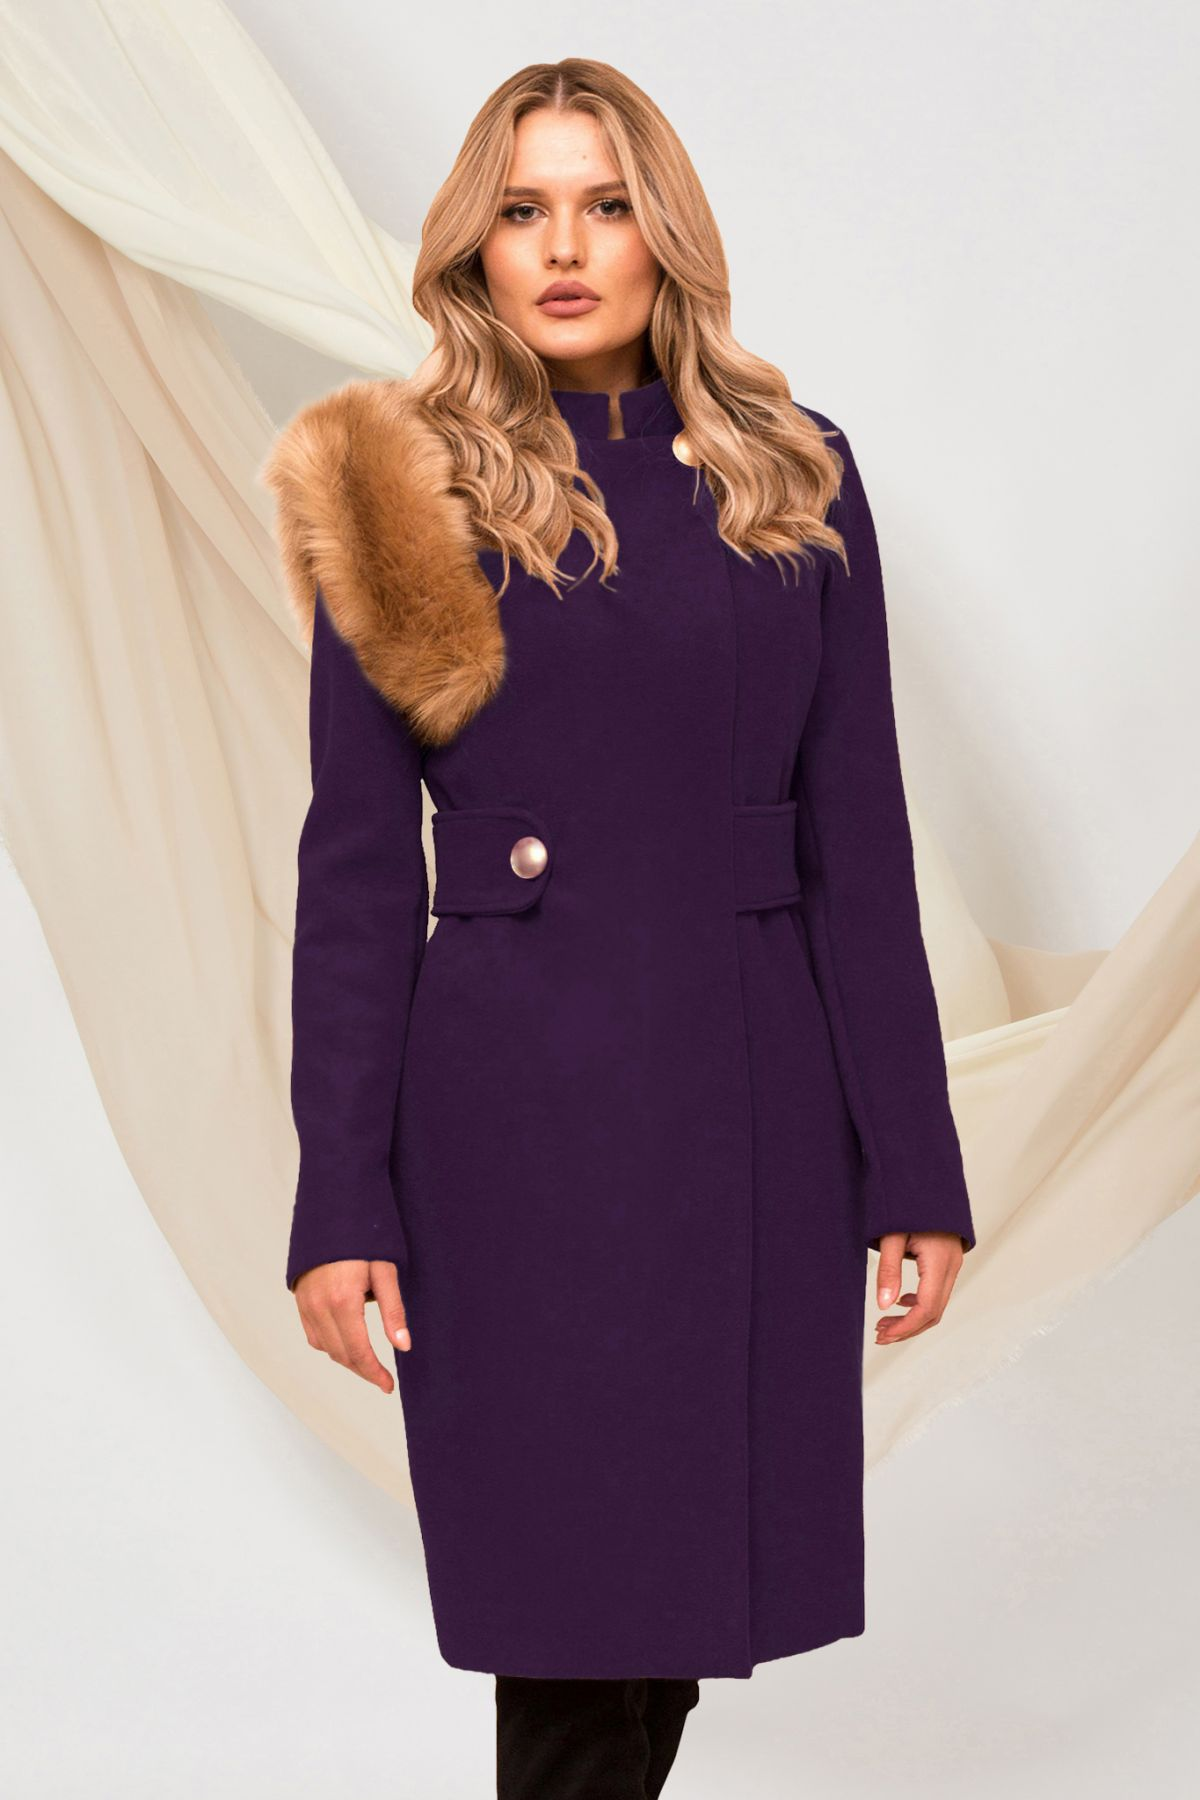 Palton dama Pretty Girl elegant violet cu blana ecologica detasabila pe umar